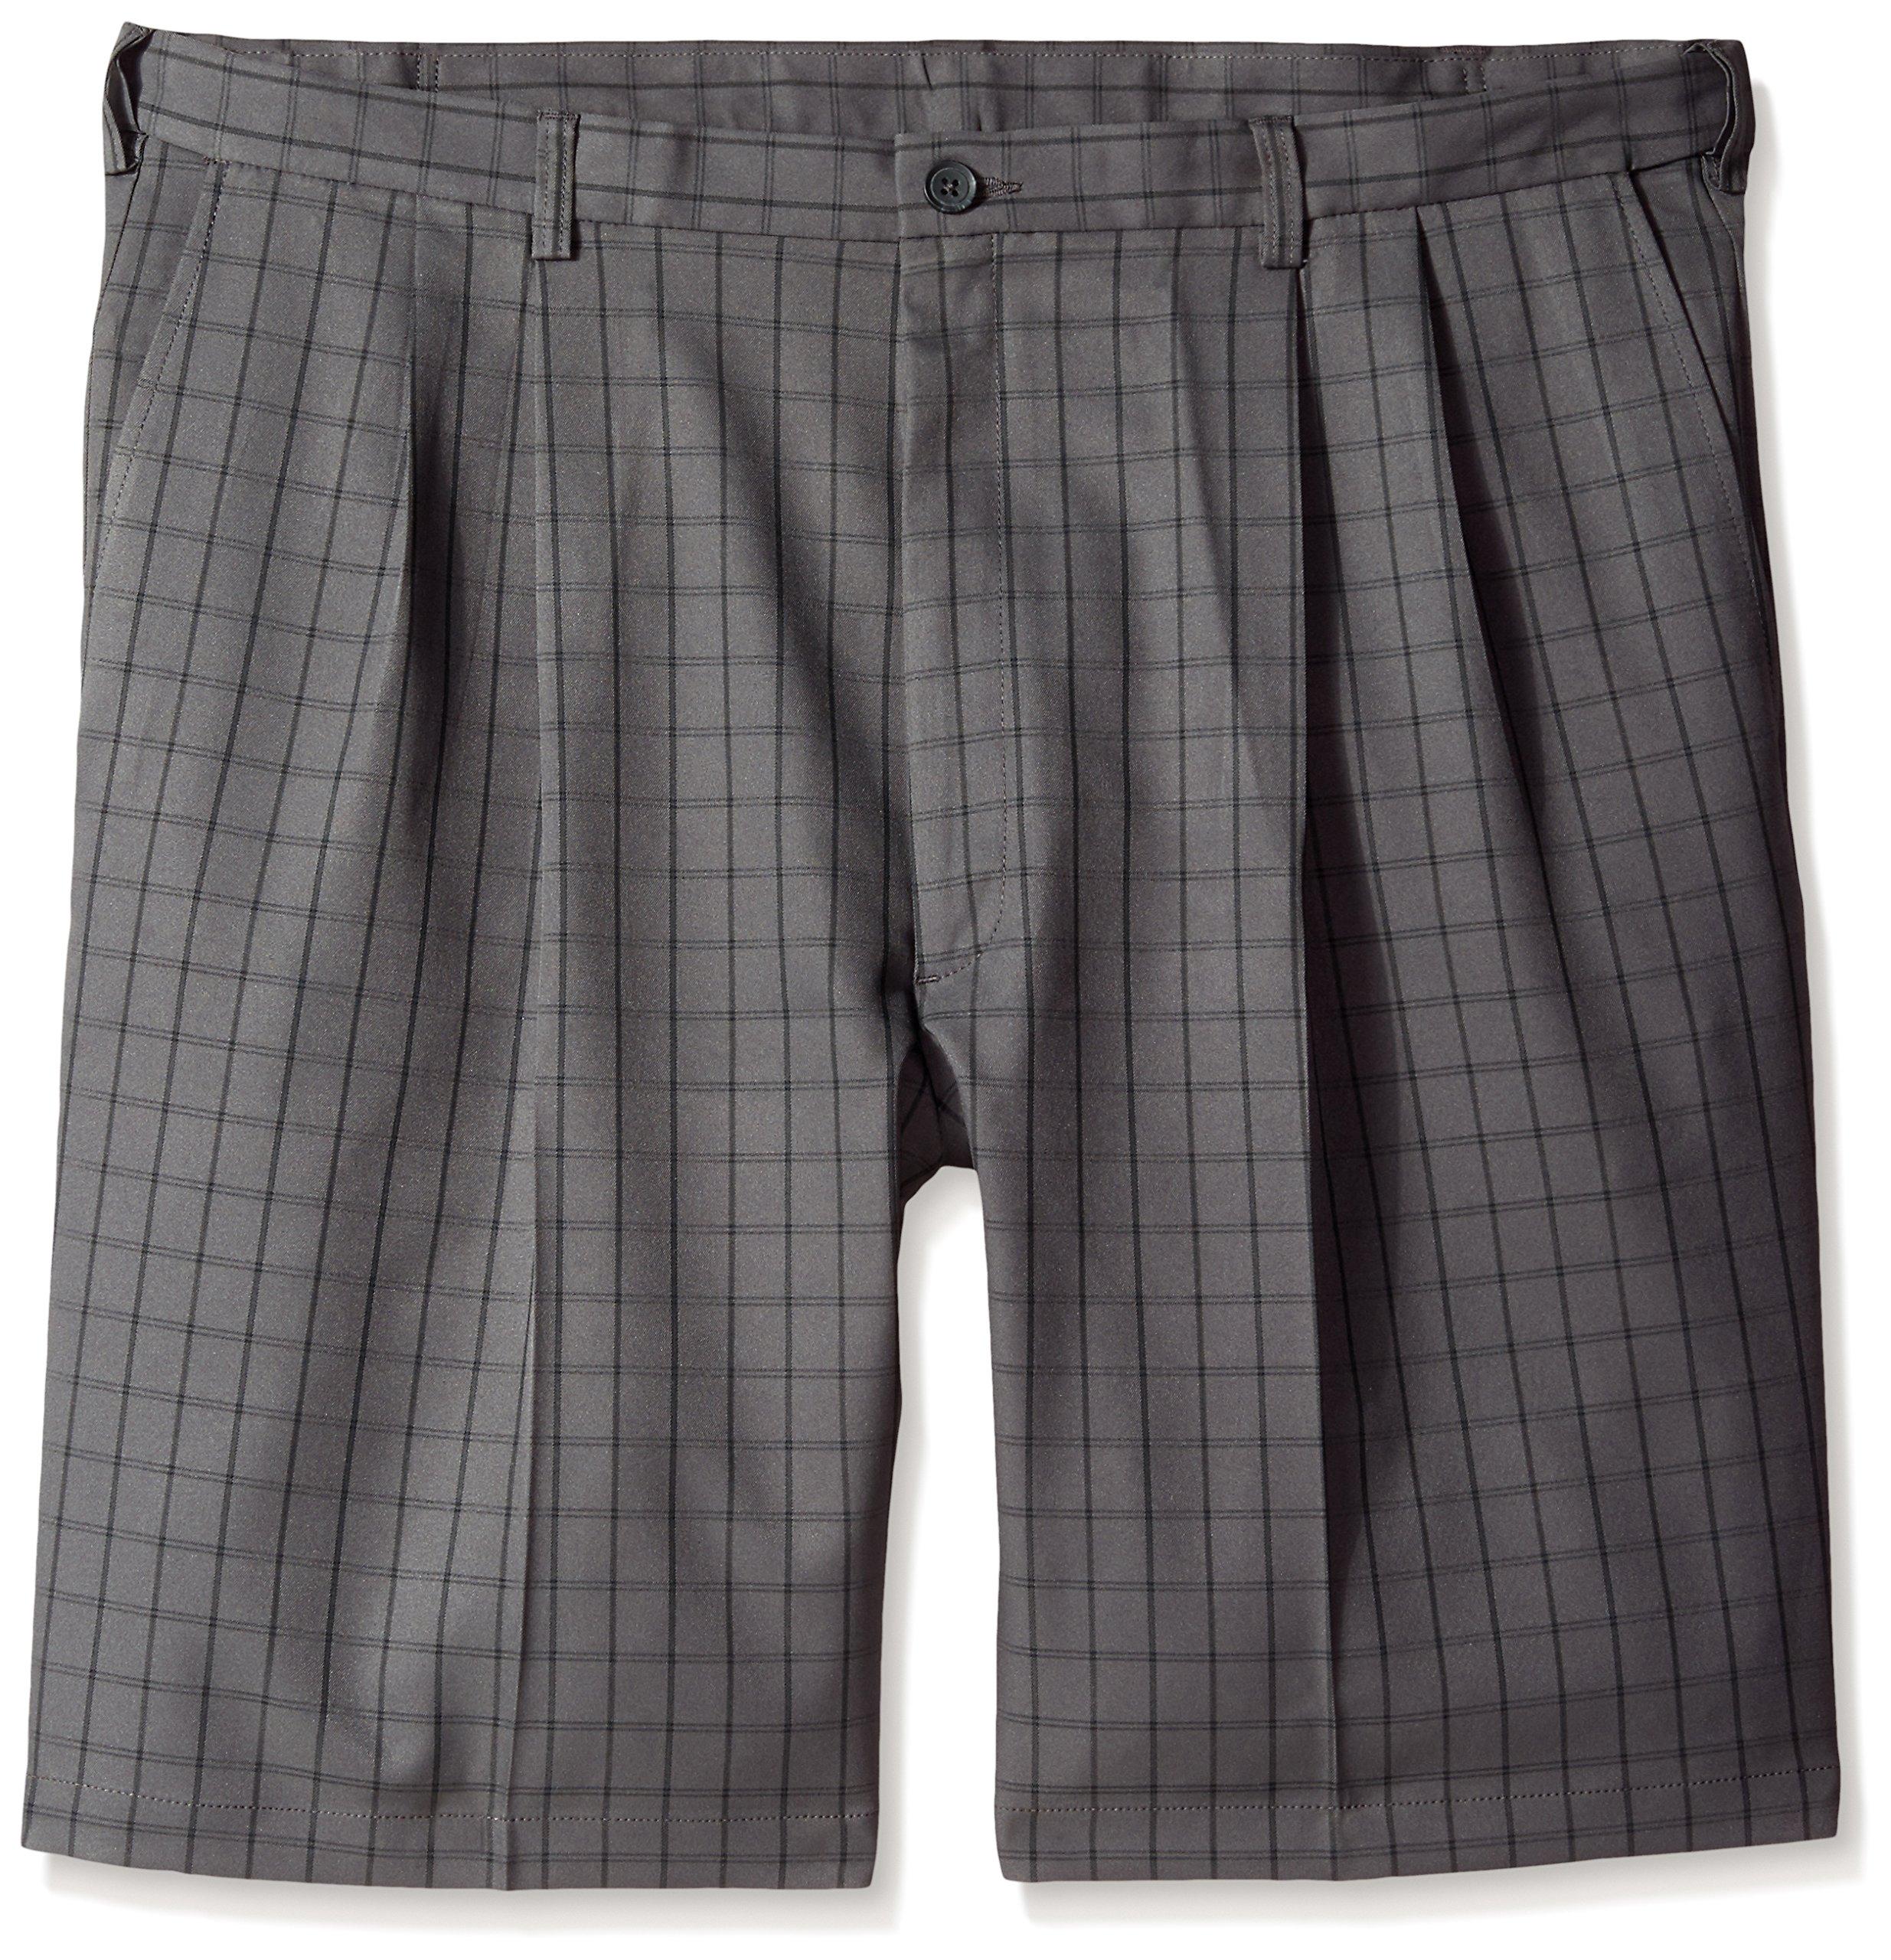 Haggar Men's Big-Tall Cool 18 Graphic Windowpane Pleat Front Short, Charcoal, 44W